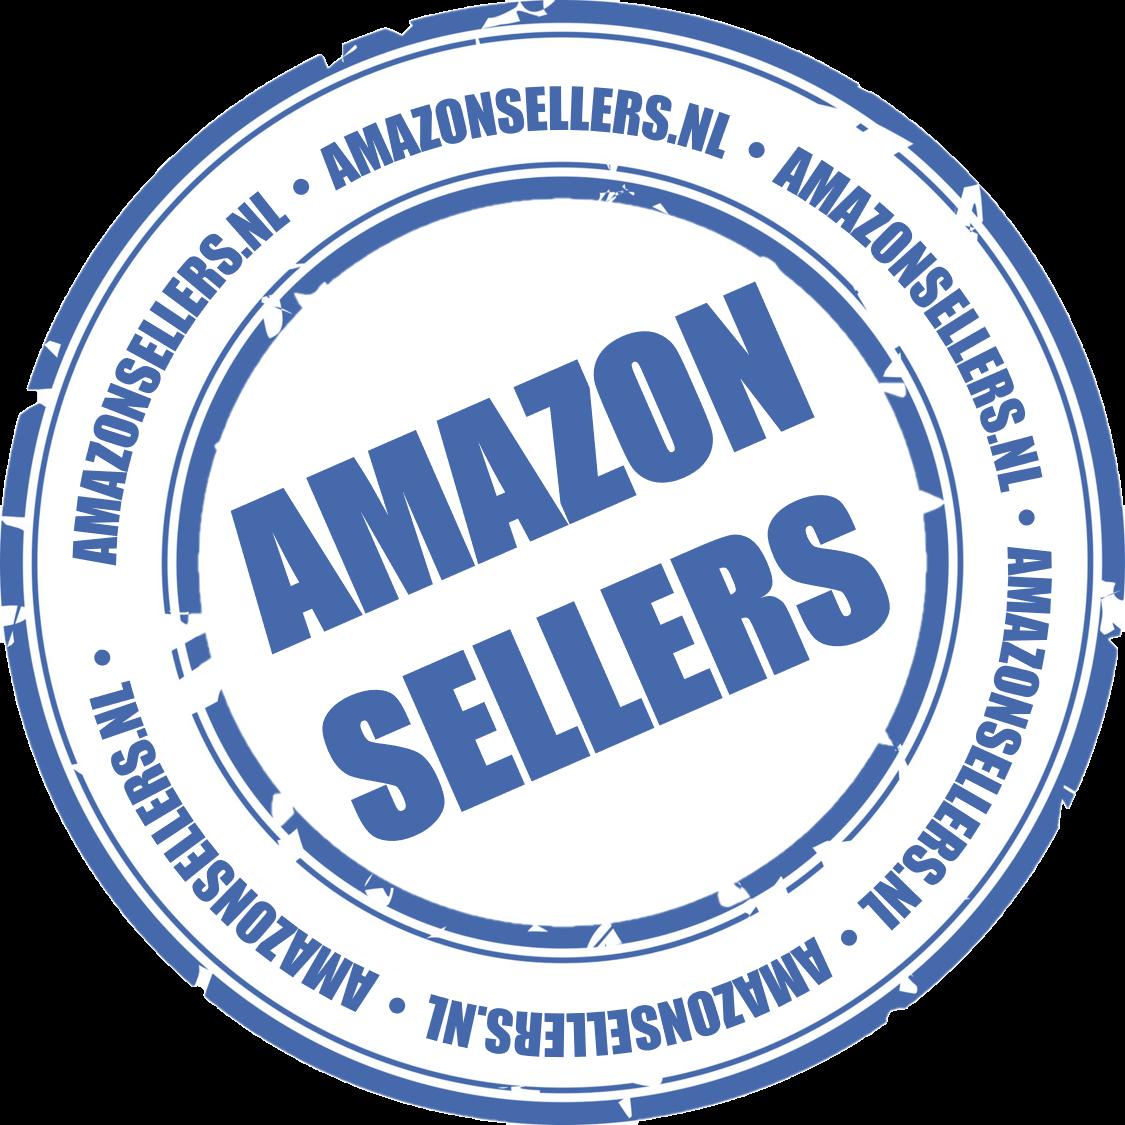 Amazonsellers.nl